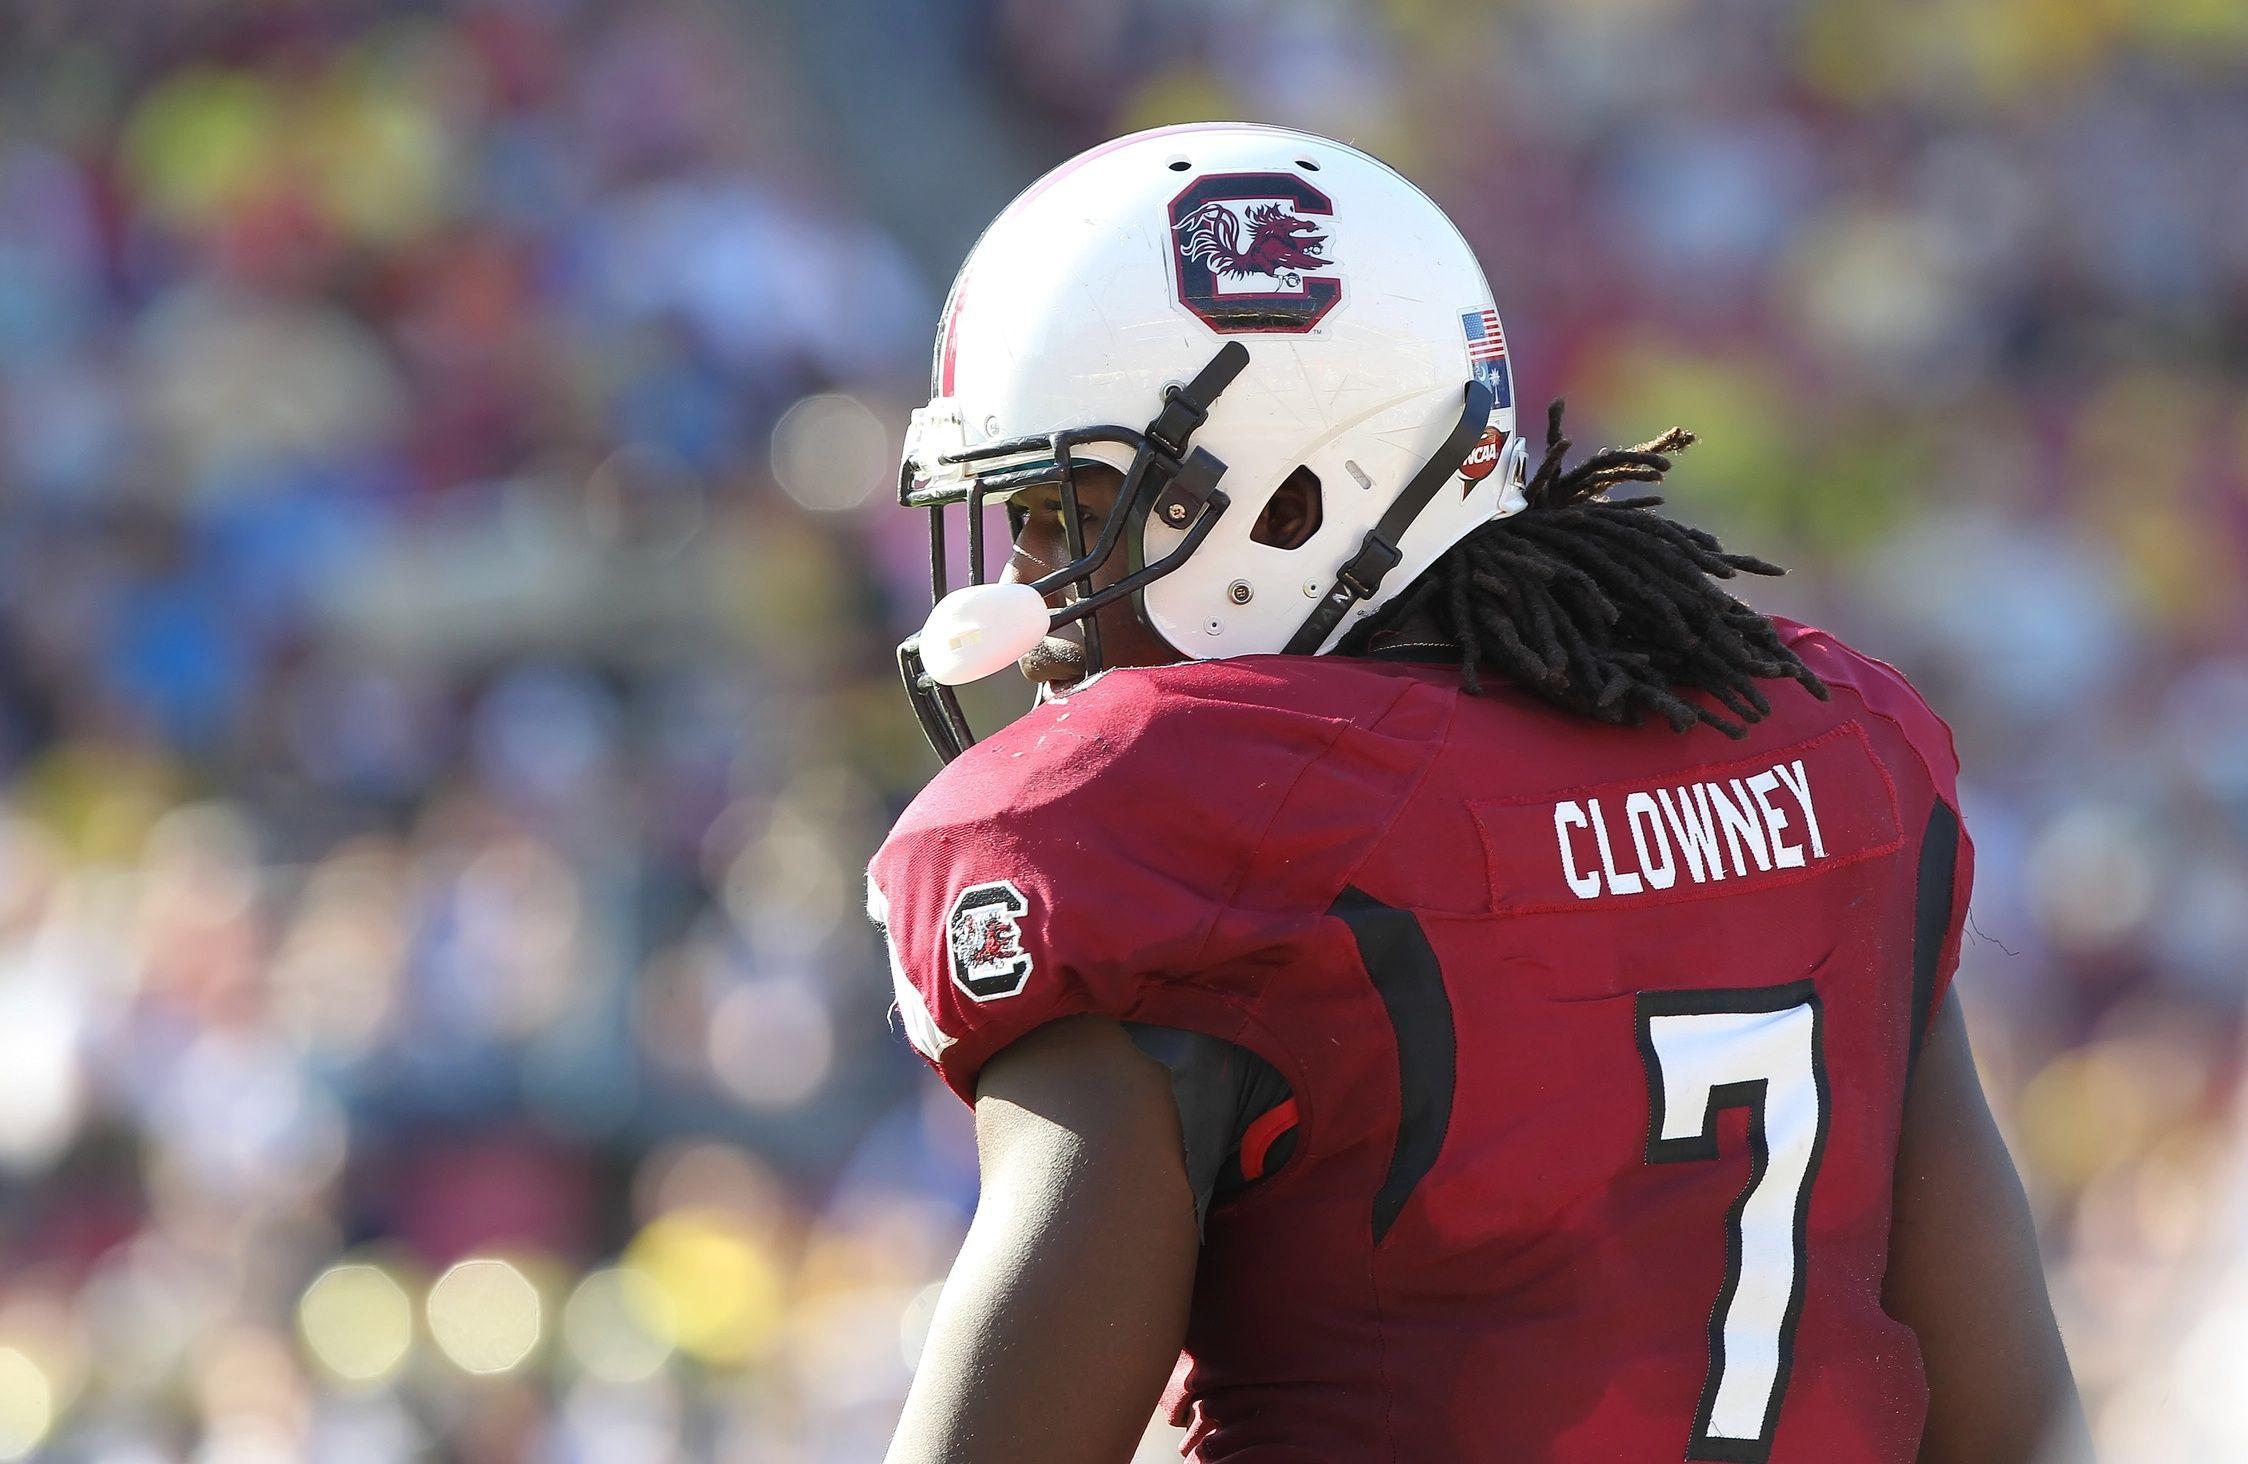 South Carolina Gamecocks defensive end Jadeveon Clowney 7